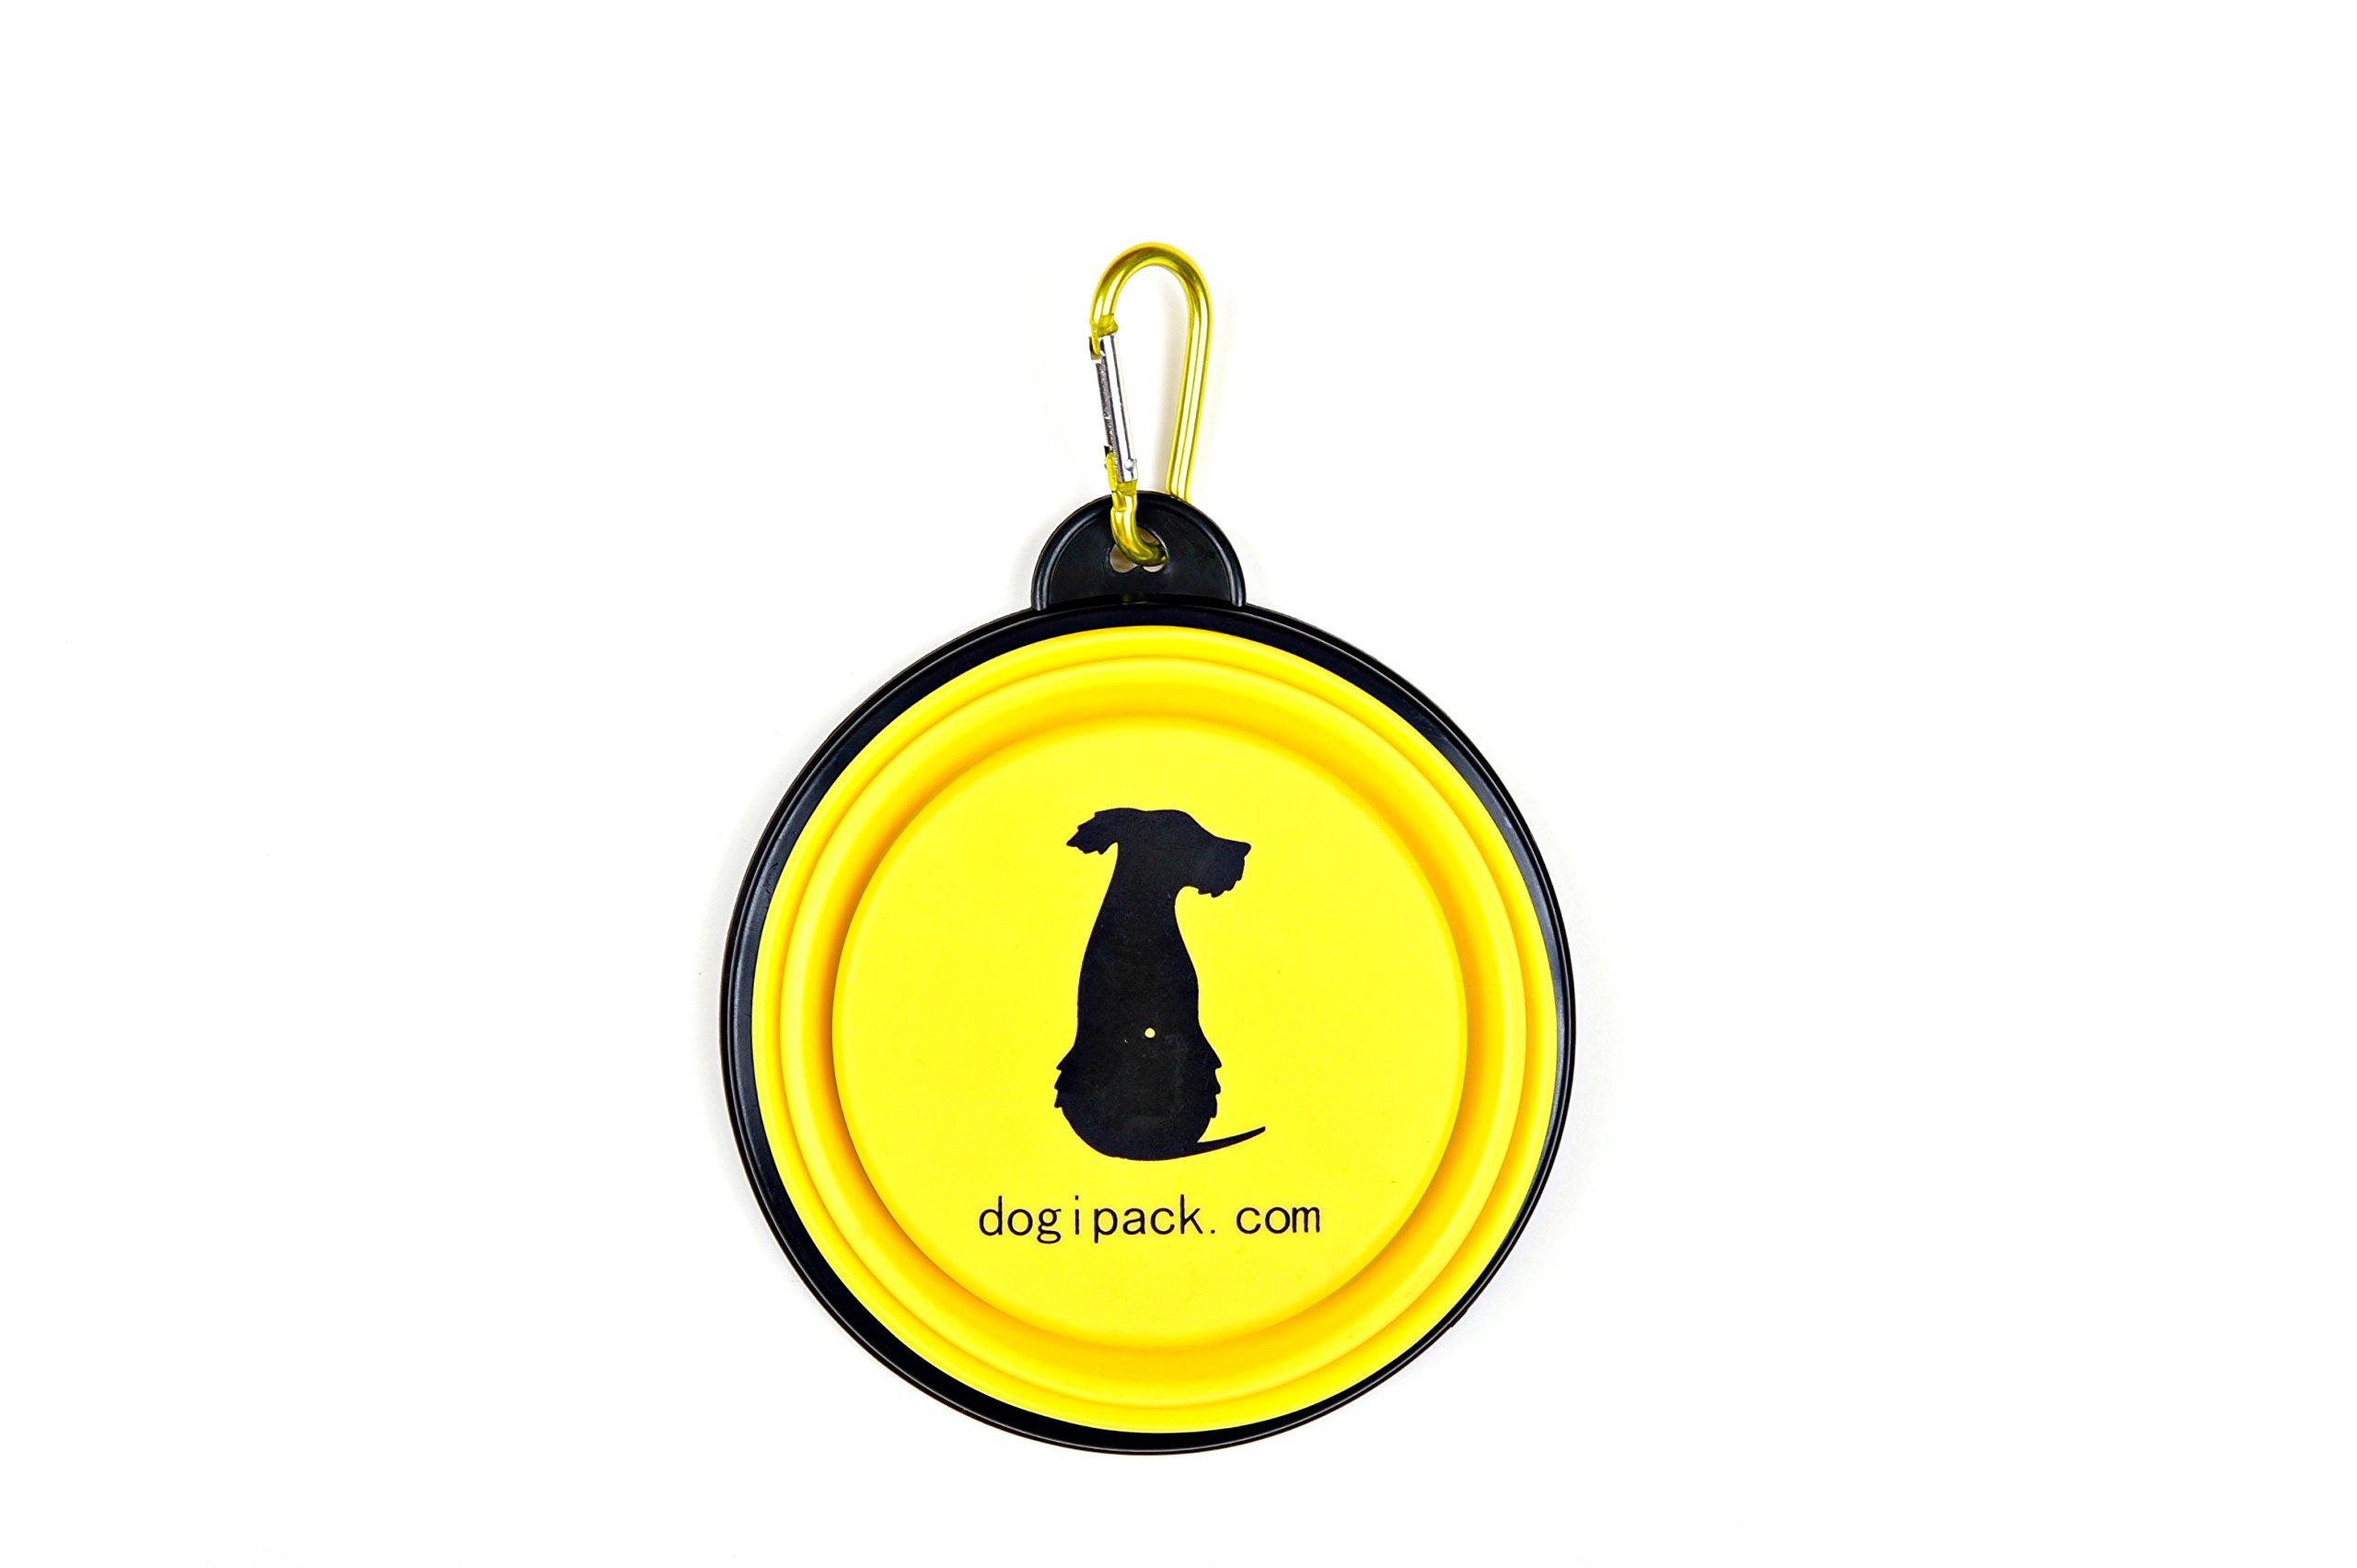 FreshStart DogiPack Hands Free and Organizational Dog Walking Belt (Grey) by FreshStart DogiPack (Image #6)